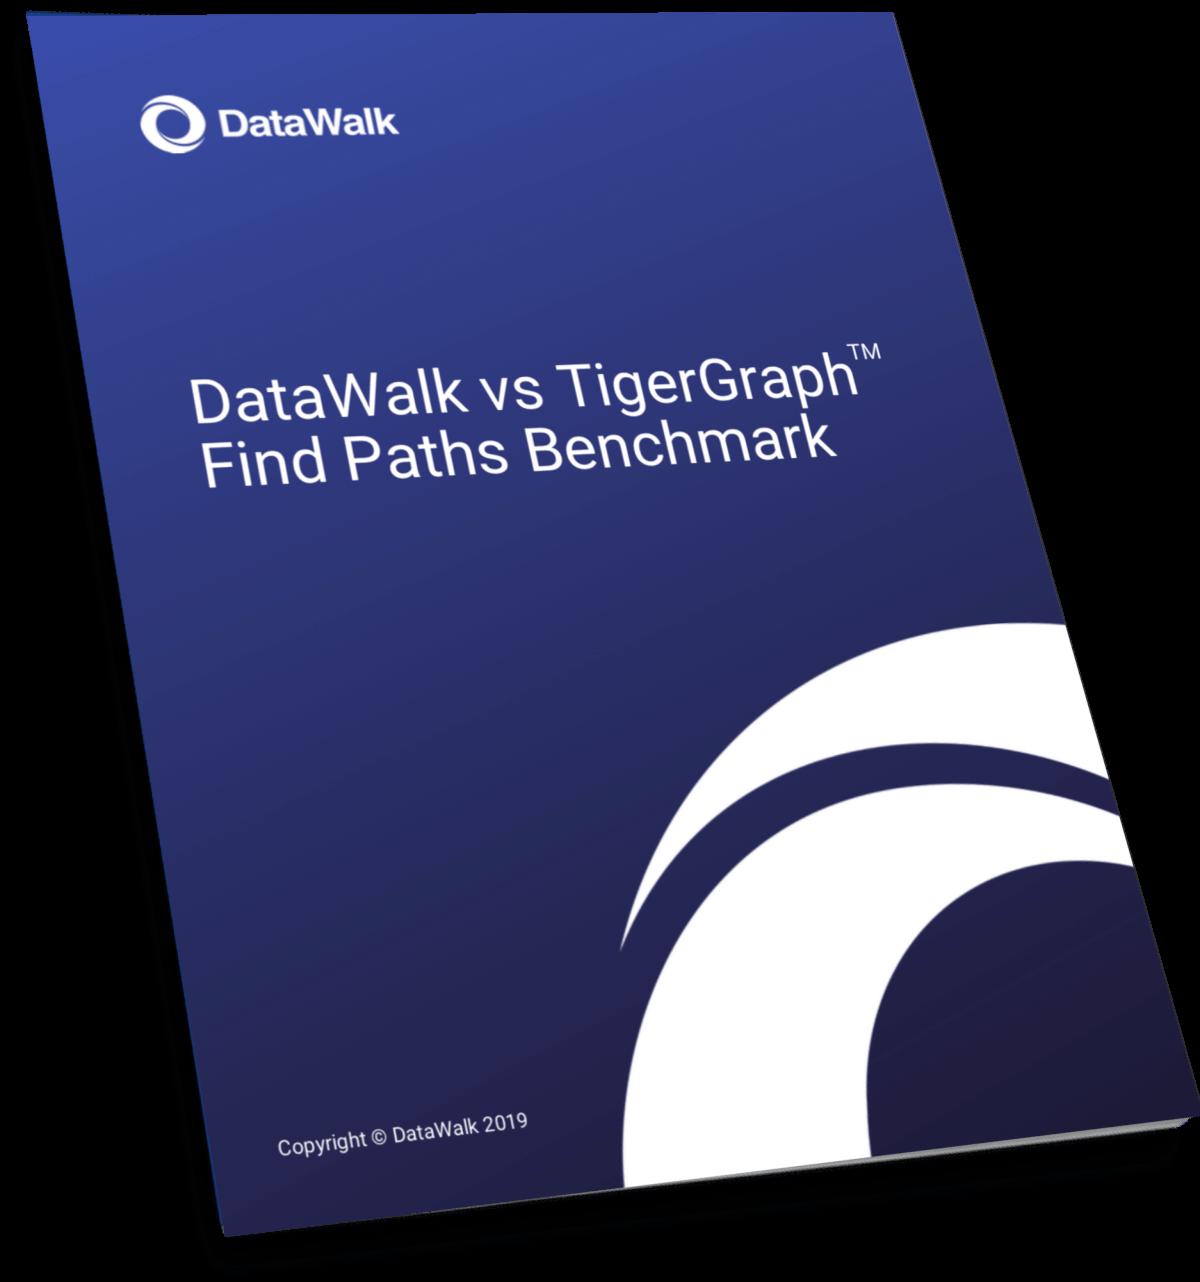 DataWalk vs TigerGraph Find Paths Benchmark